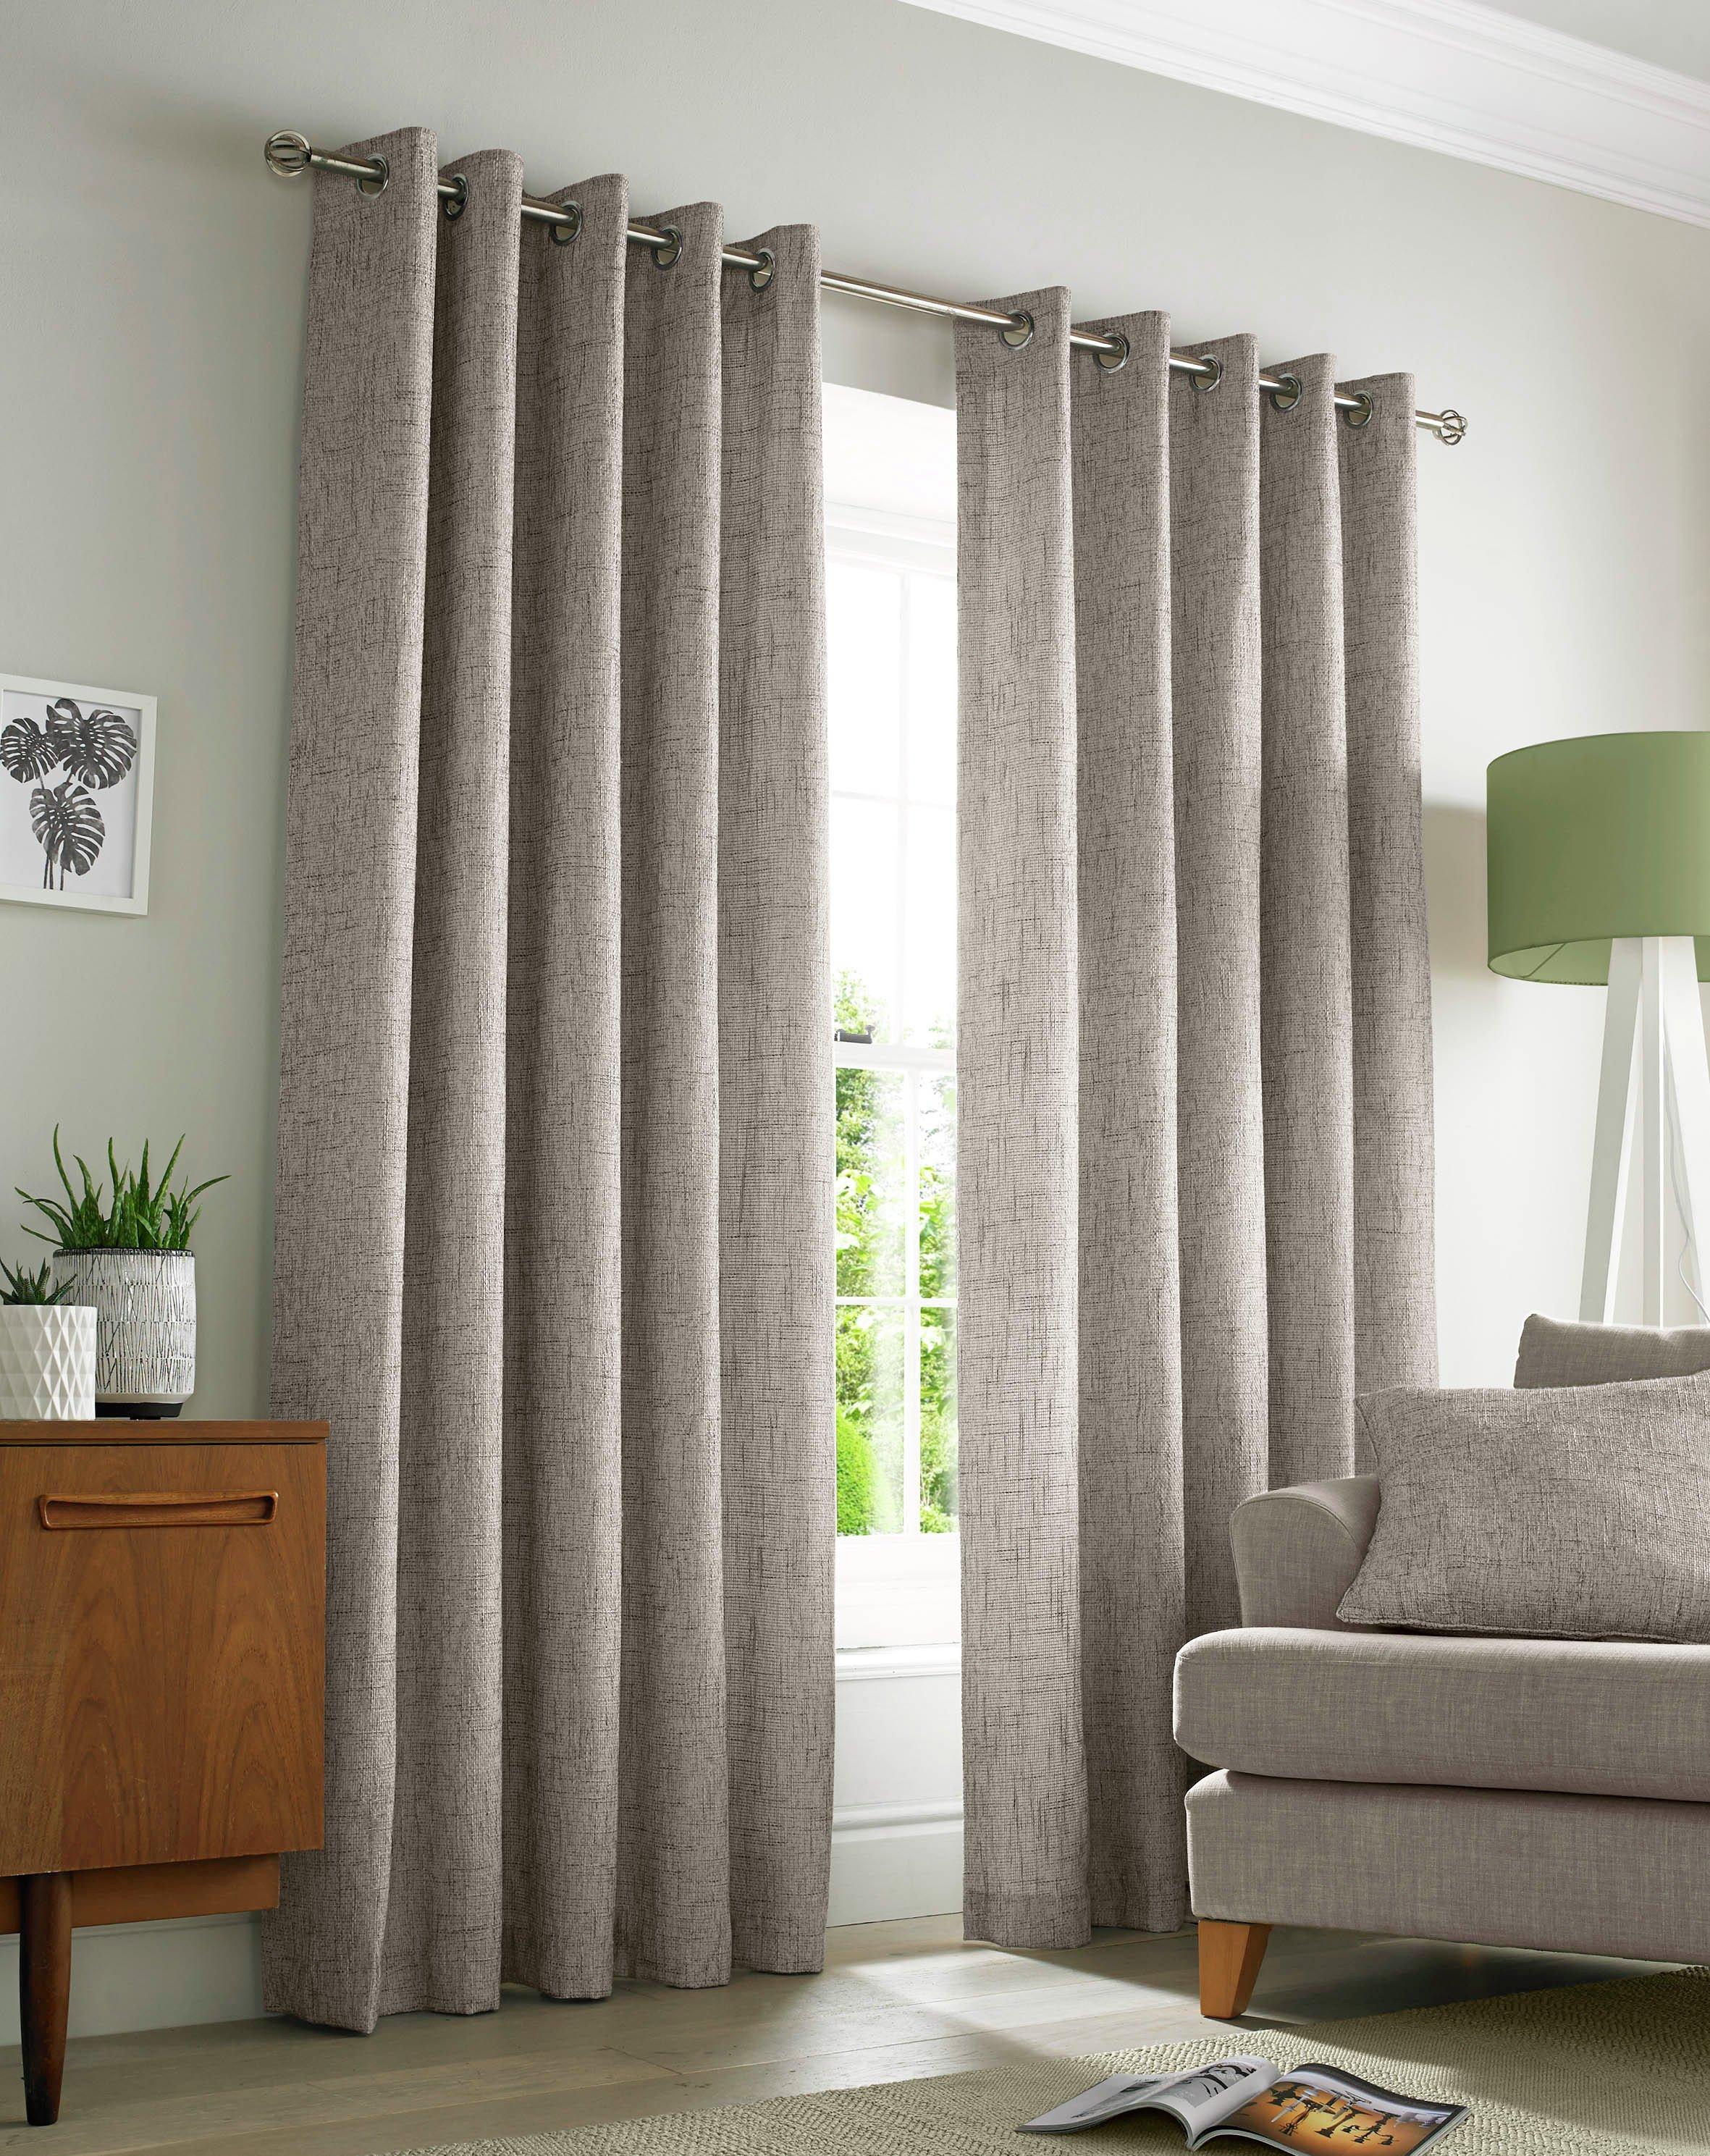 Academy Eyelet Curtains - 165x229cm - Natural.